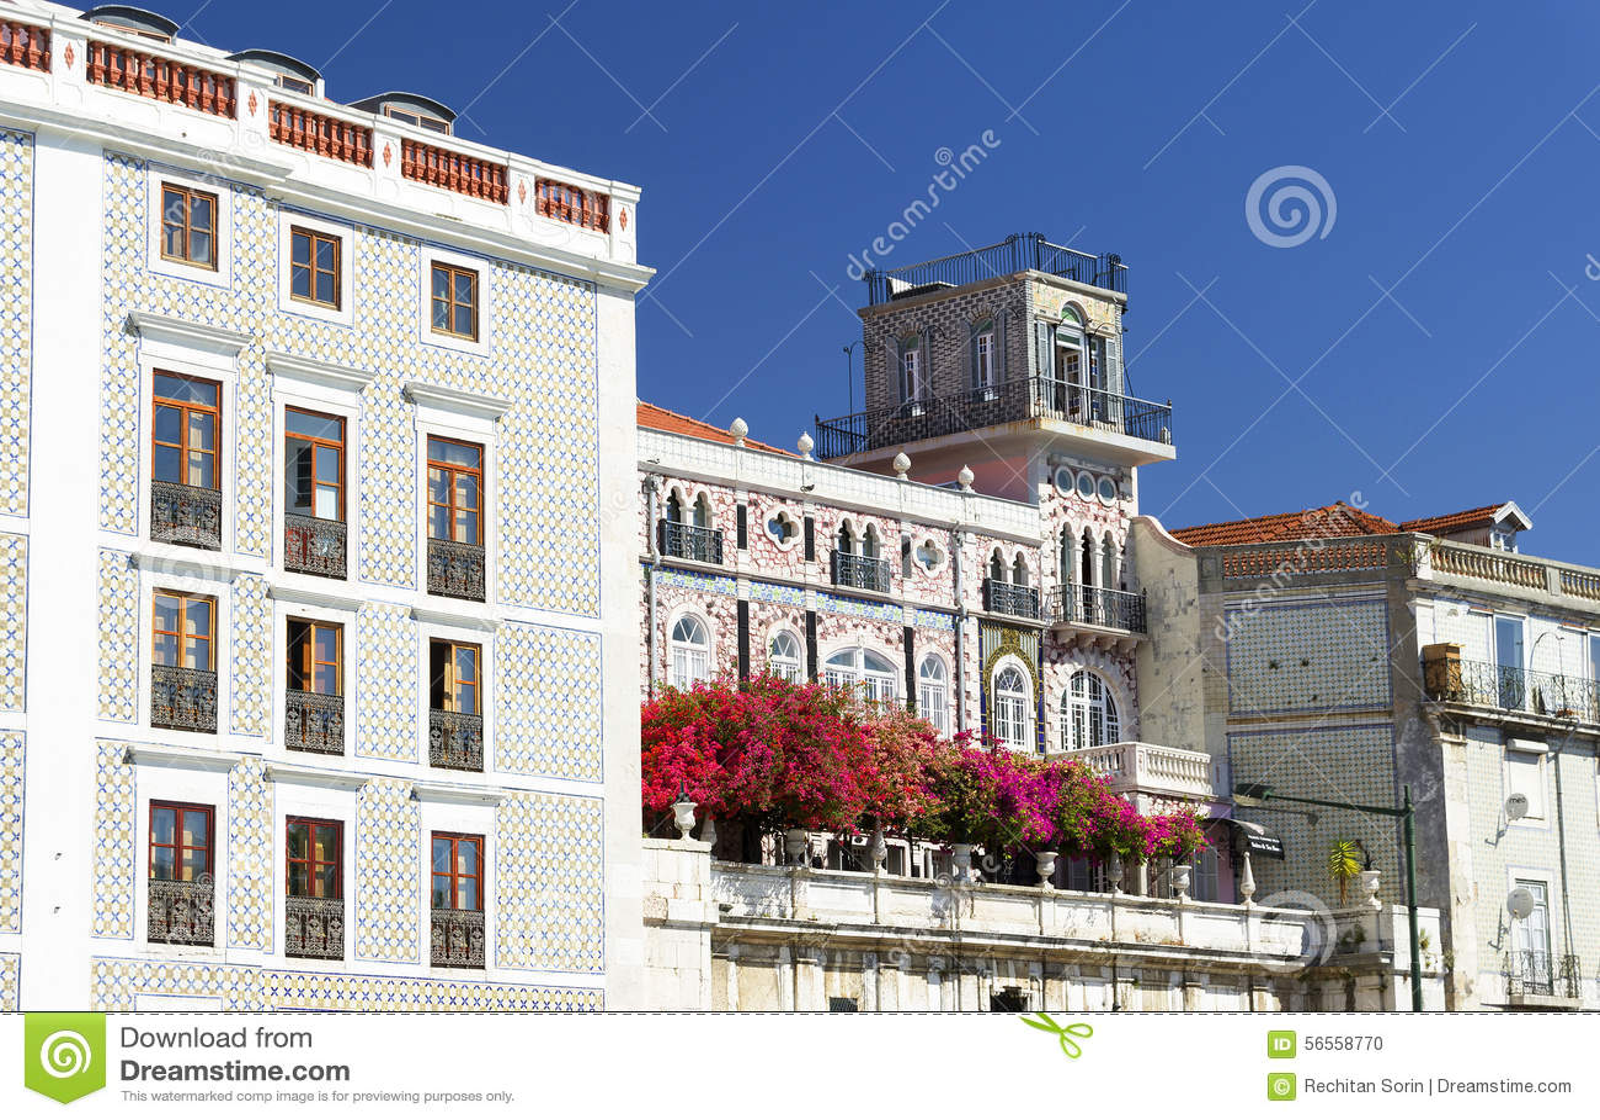 Download Αρχιτεκτονική λεπτομέρεια στη Λισσαβώνα Στοκ Εικόνες - εικόνα από ιστορικός, εμπορικός: 56558770